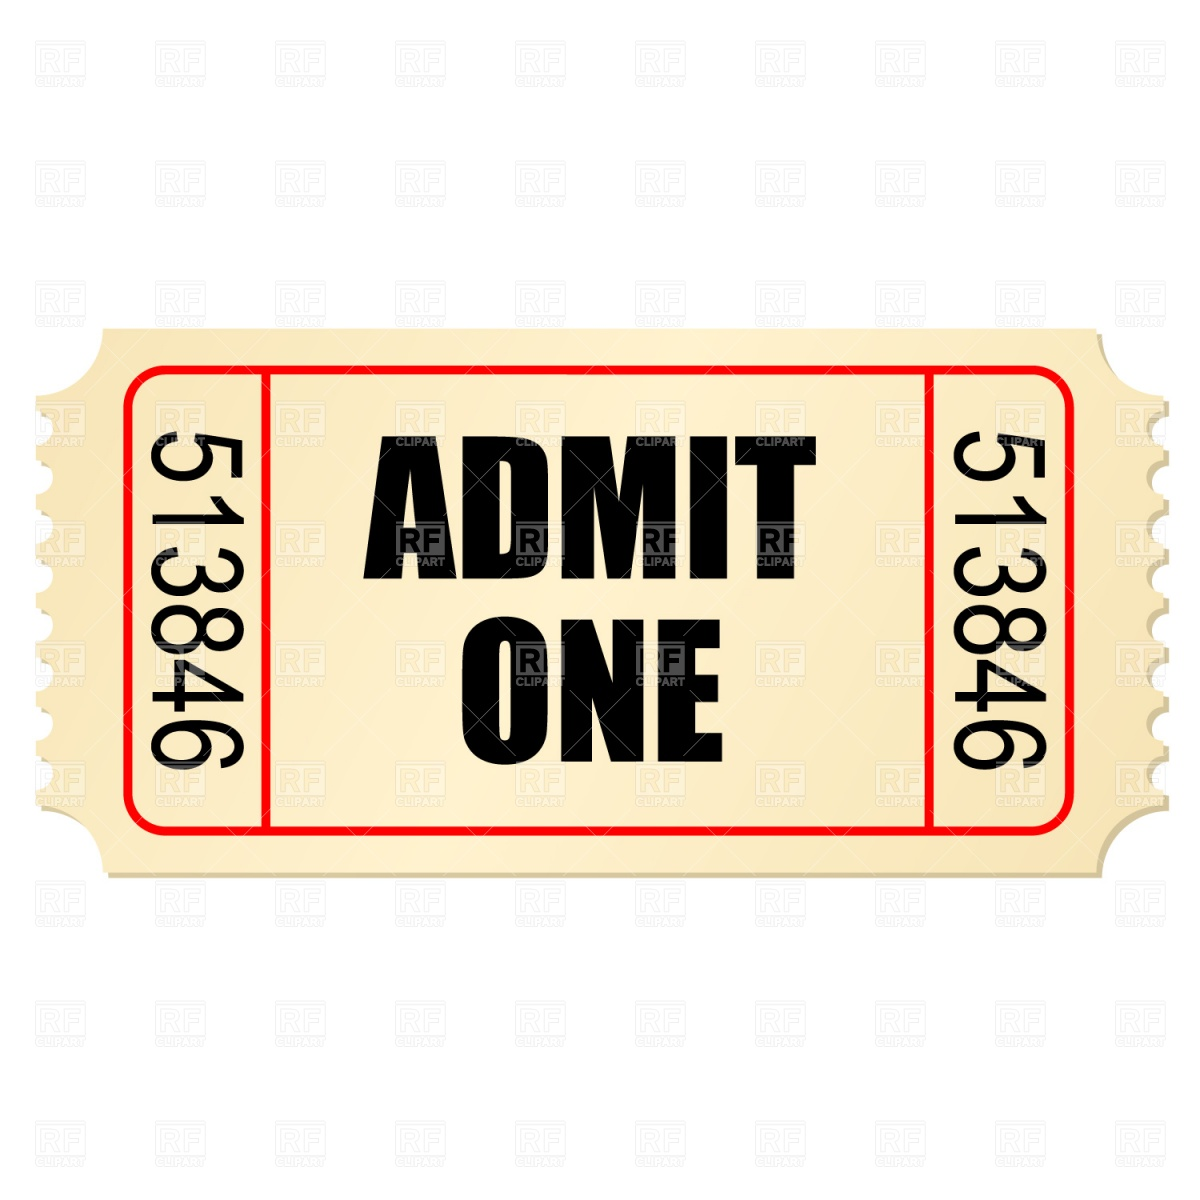 Stub clipart Stub Stub Ticket Clipart cliparts